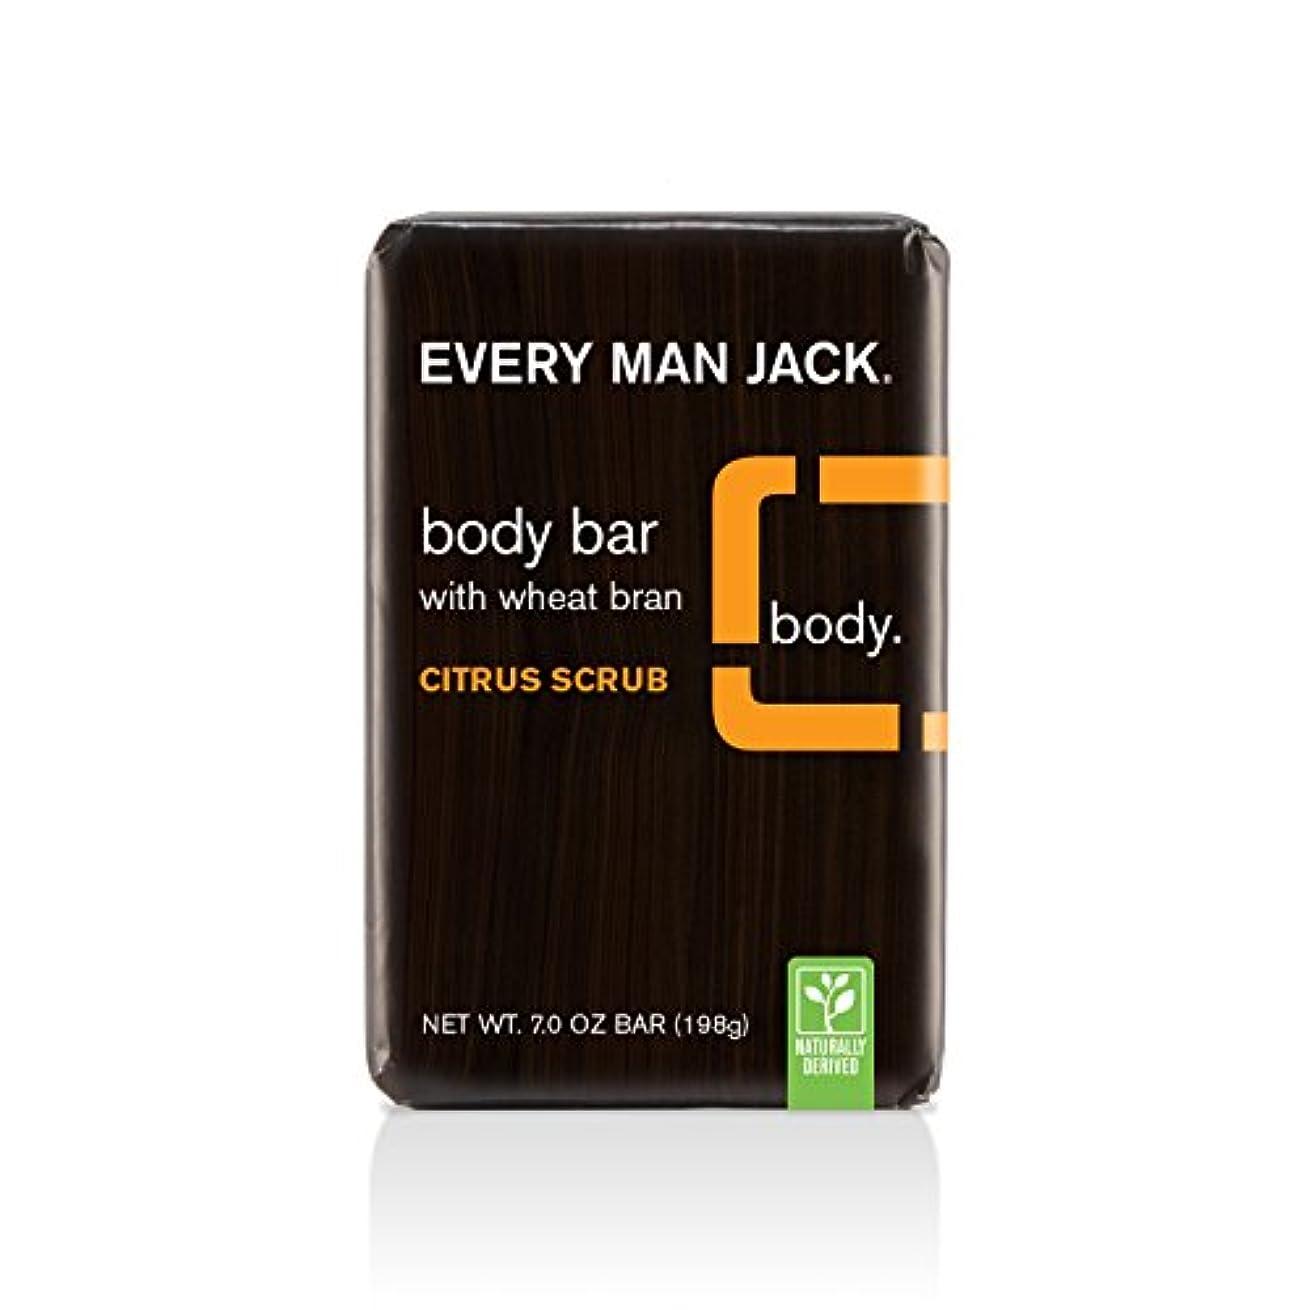 苦難市長市の花海外直送品Body Bar Soap, Citrus Scrub 7 oz by Every Man Jack